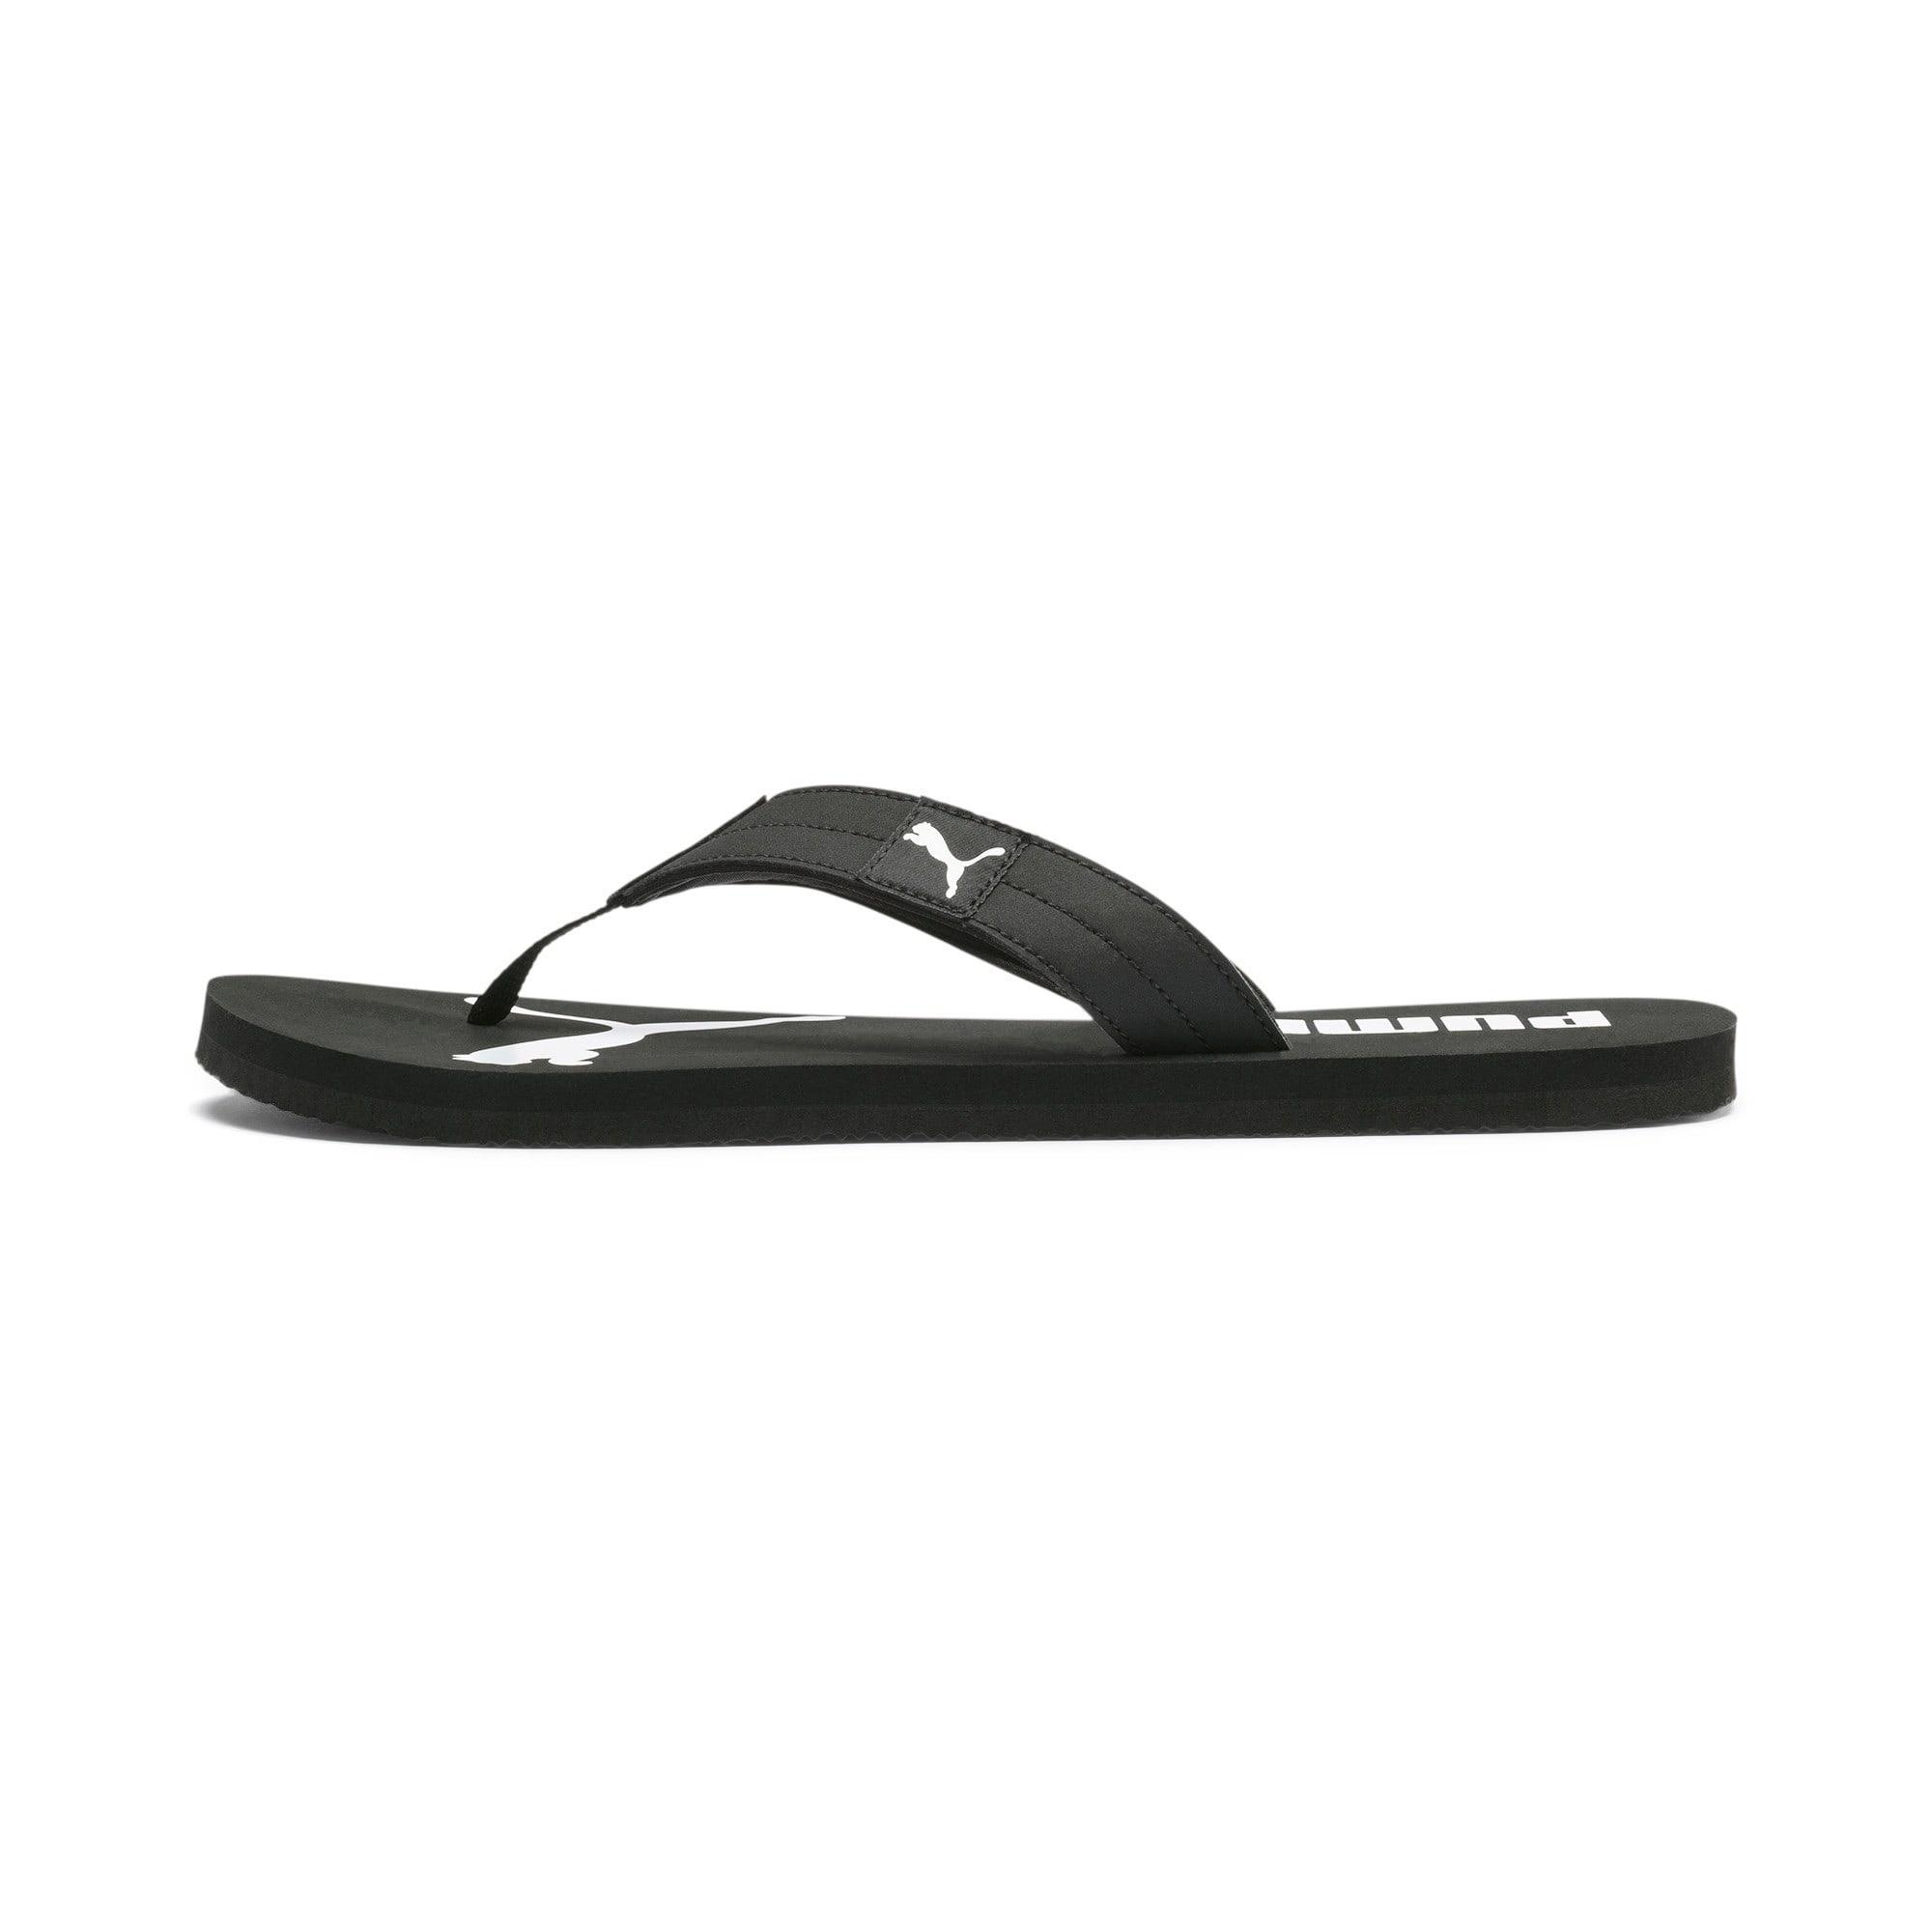 Thumbnail 1 of Cosy Flip Sandals, Puma Black-Puma White, medium